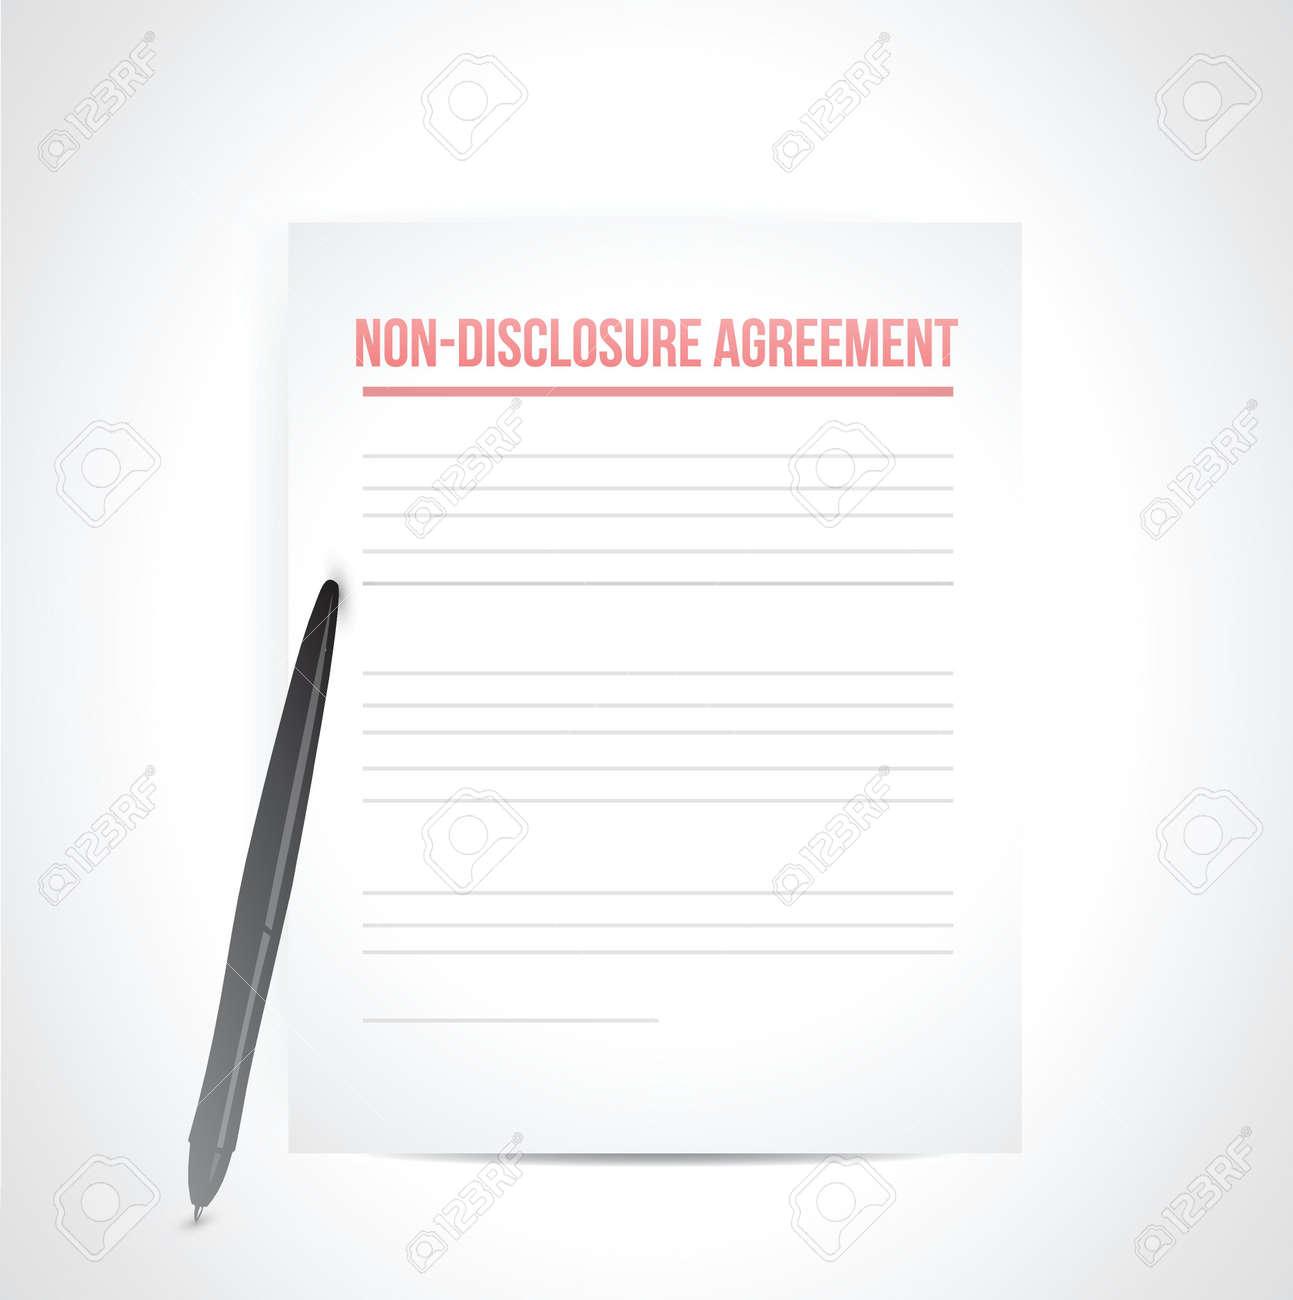 non disclosure agreement documents. illustration design over white Stock Vector - 21603118